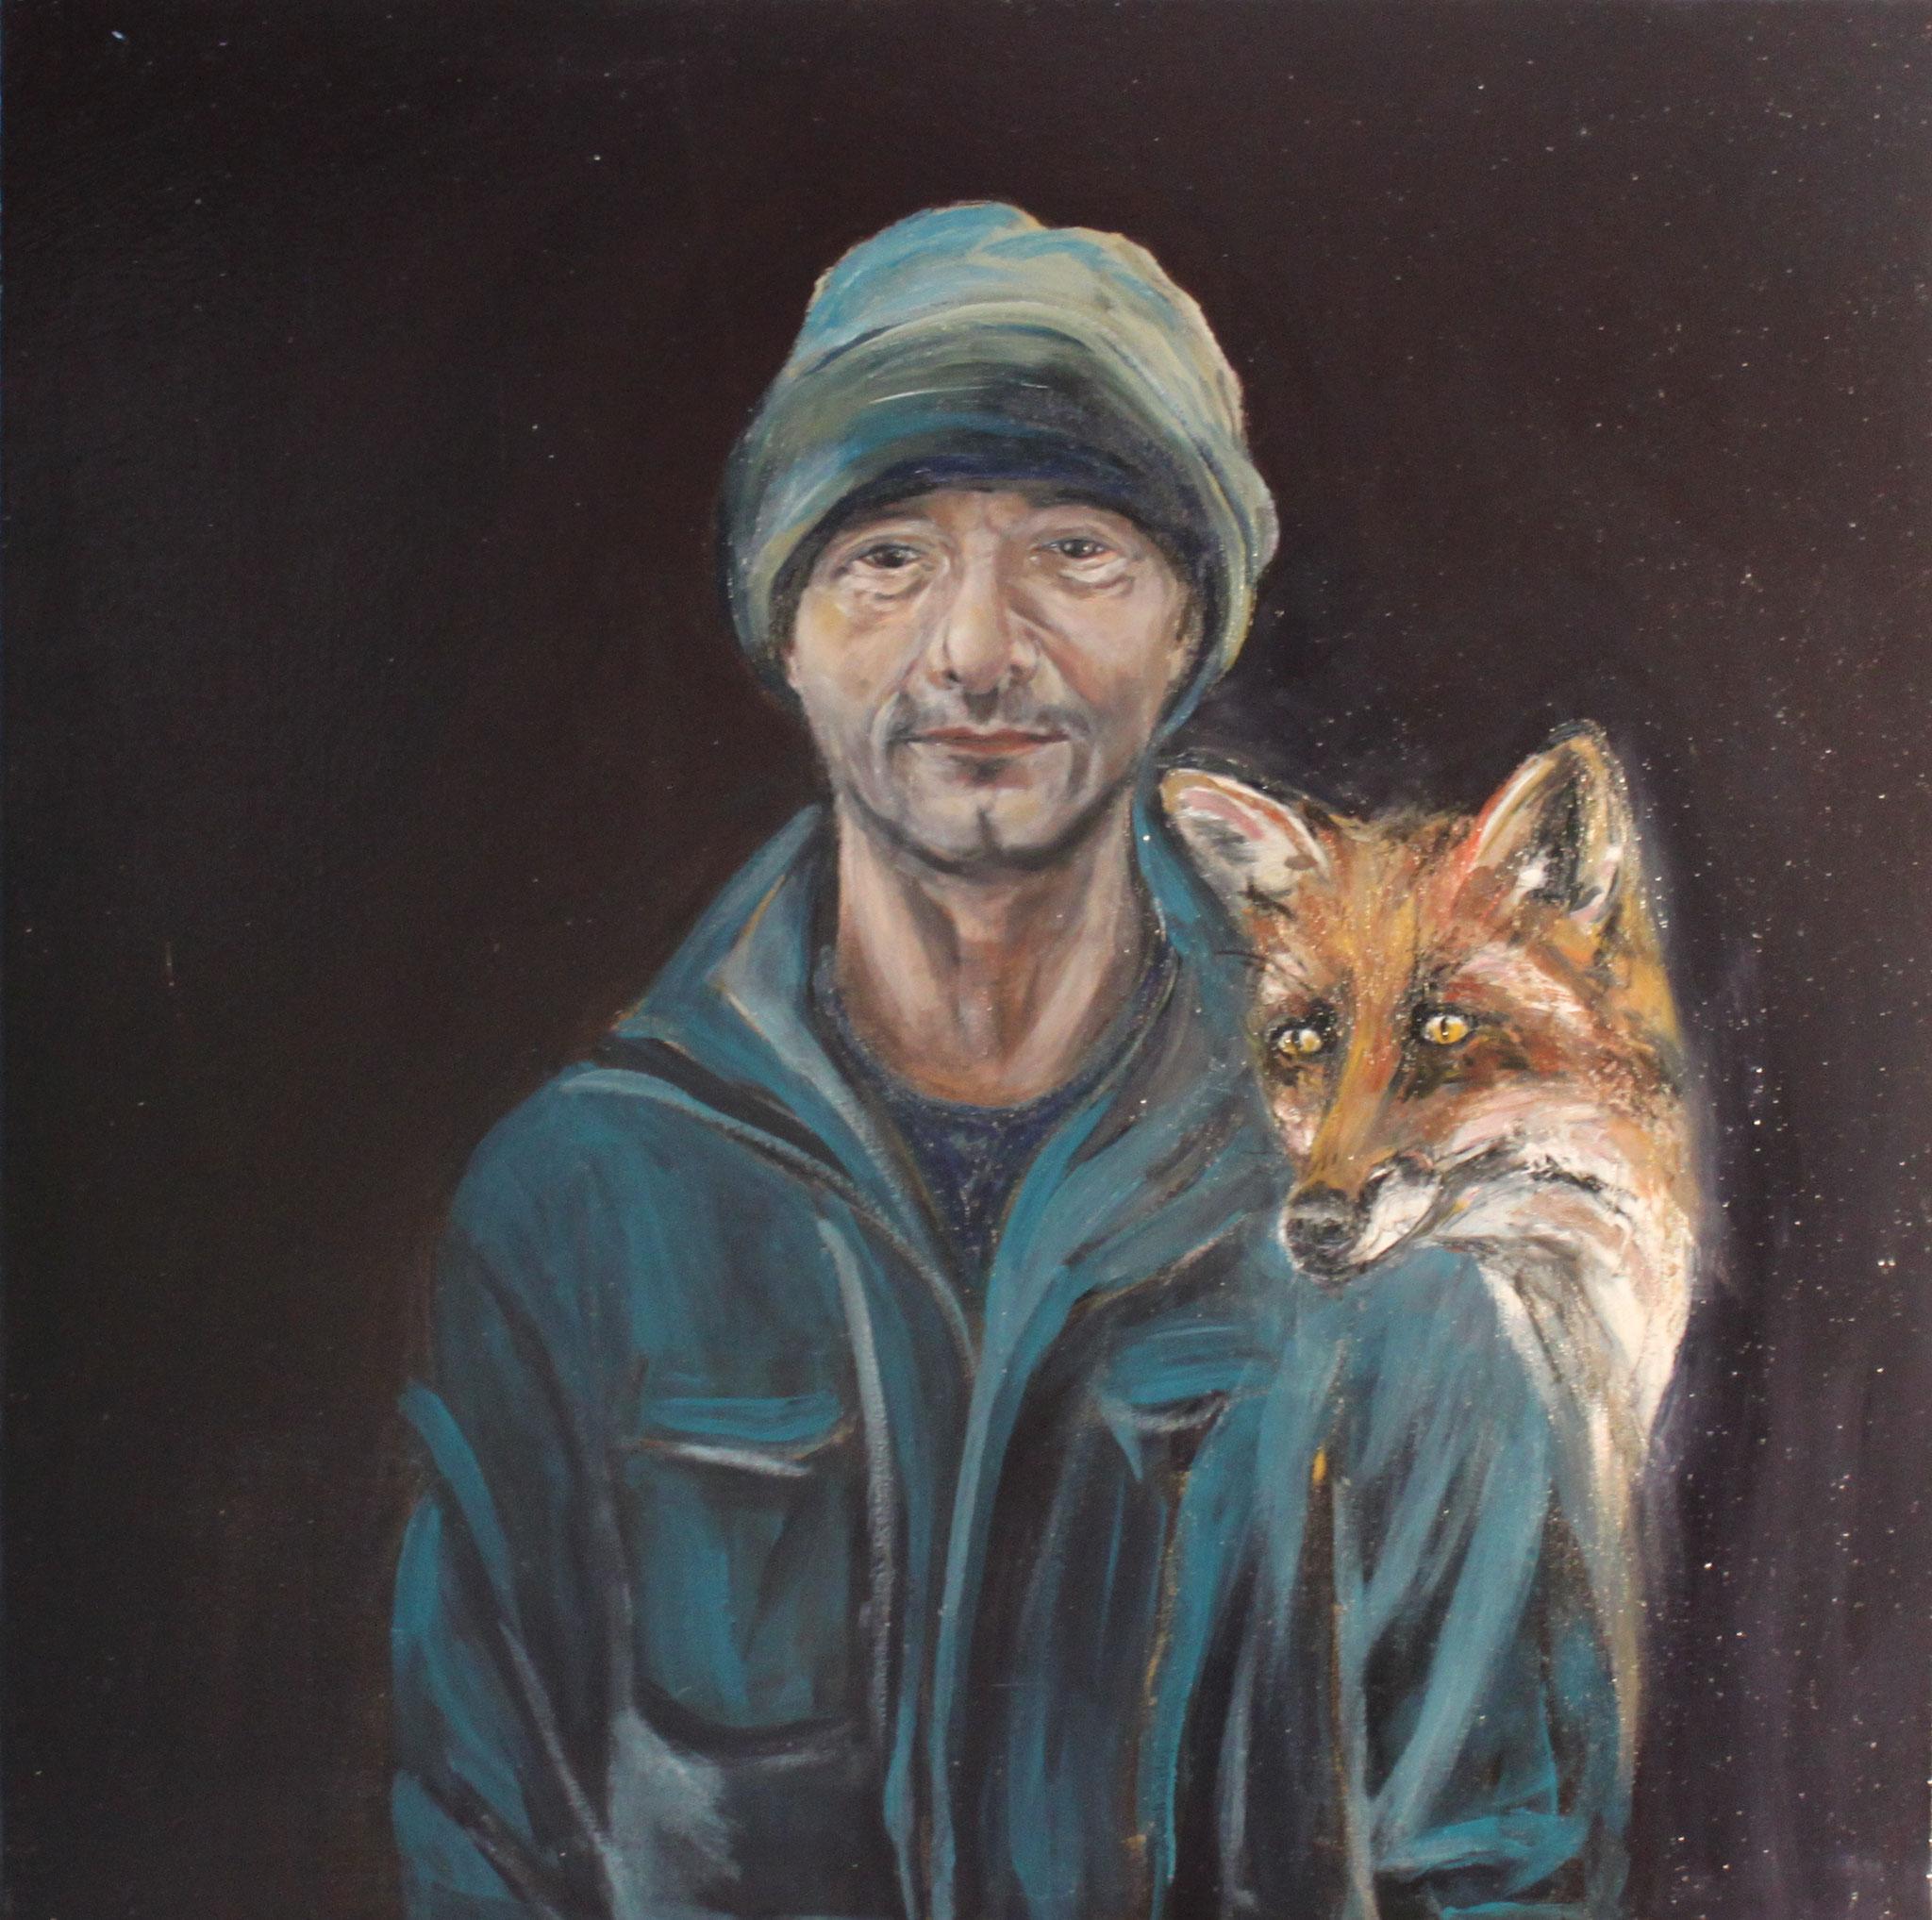 Zoran, 2017, Öl auf Leinwand, 80 cm x 80 cm x 4 cm